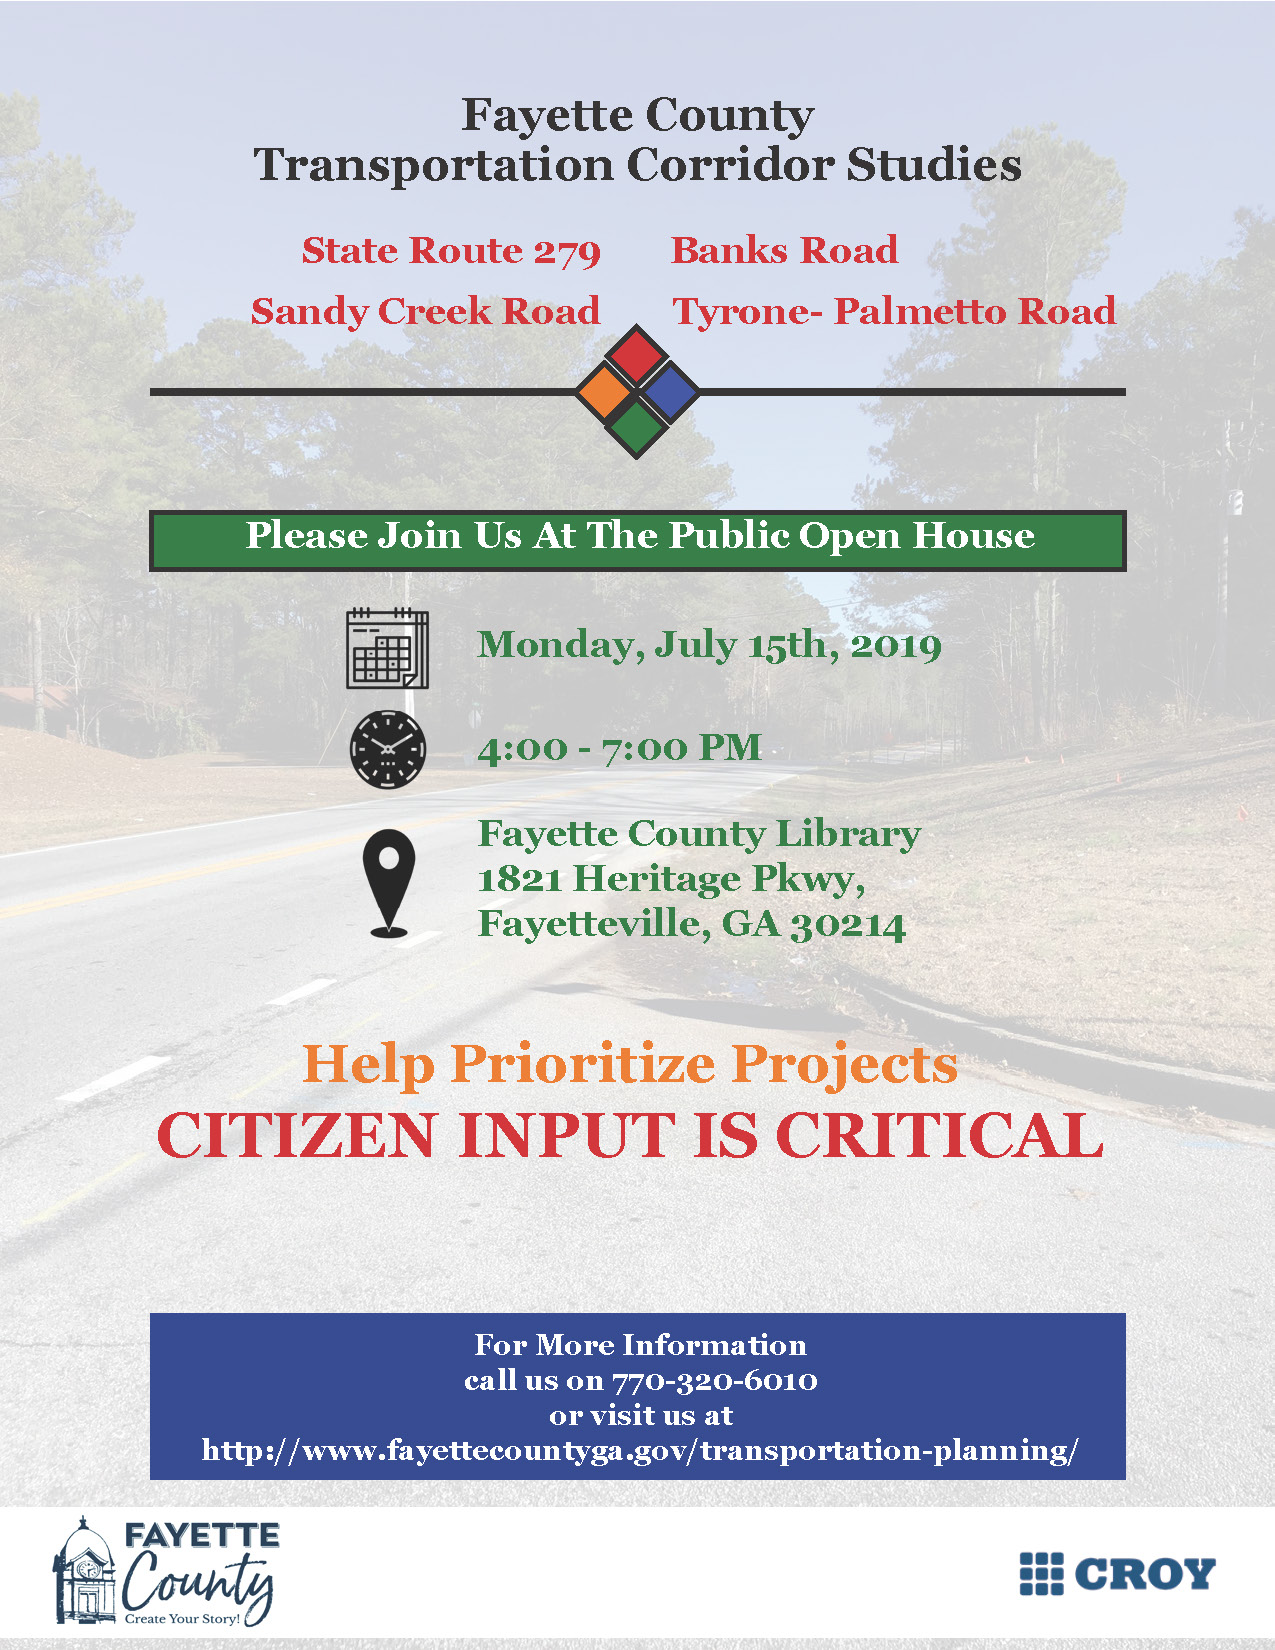 2019 Fayette County Corridor Study